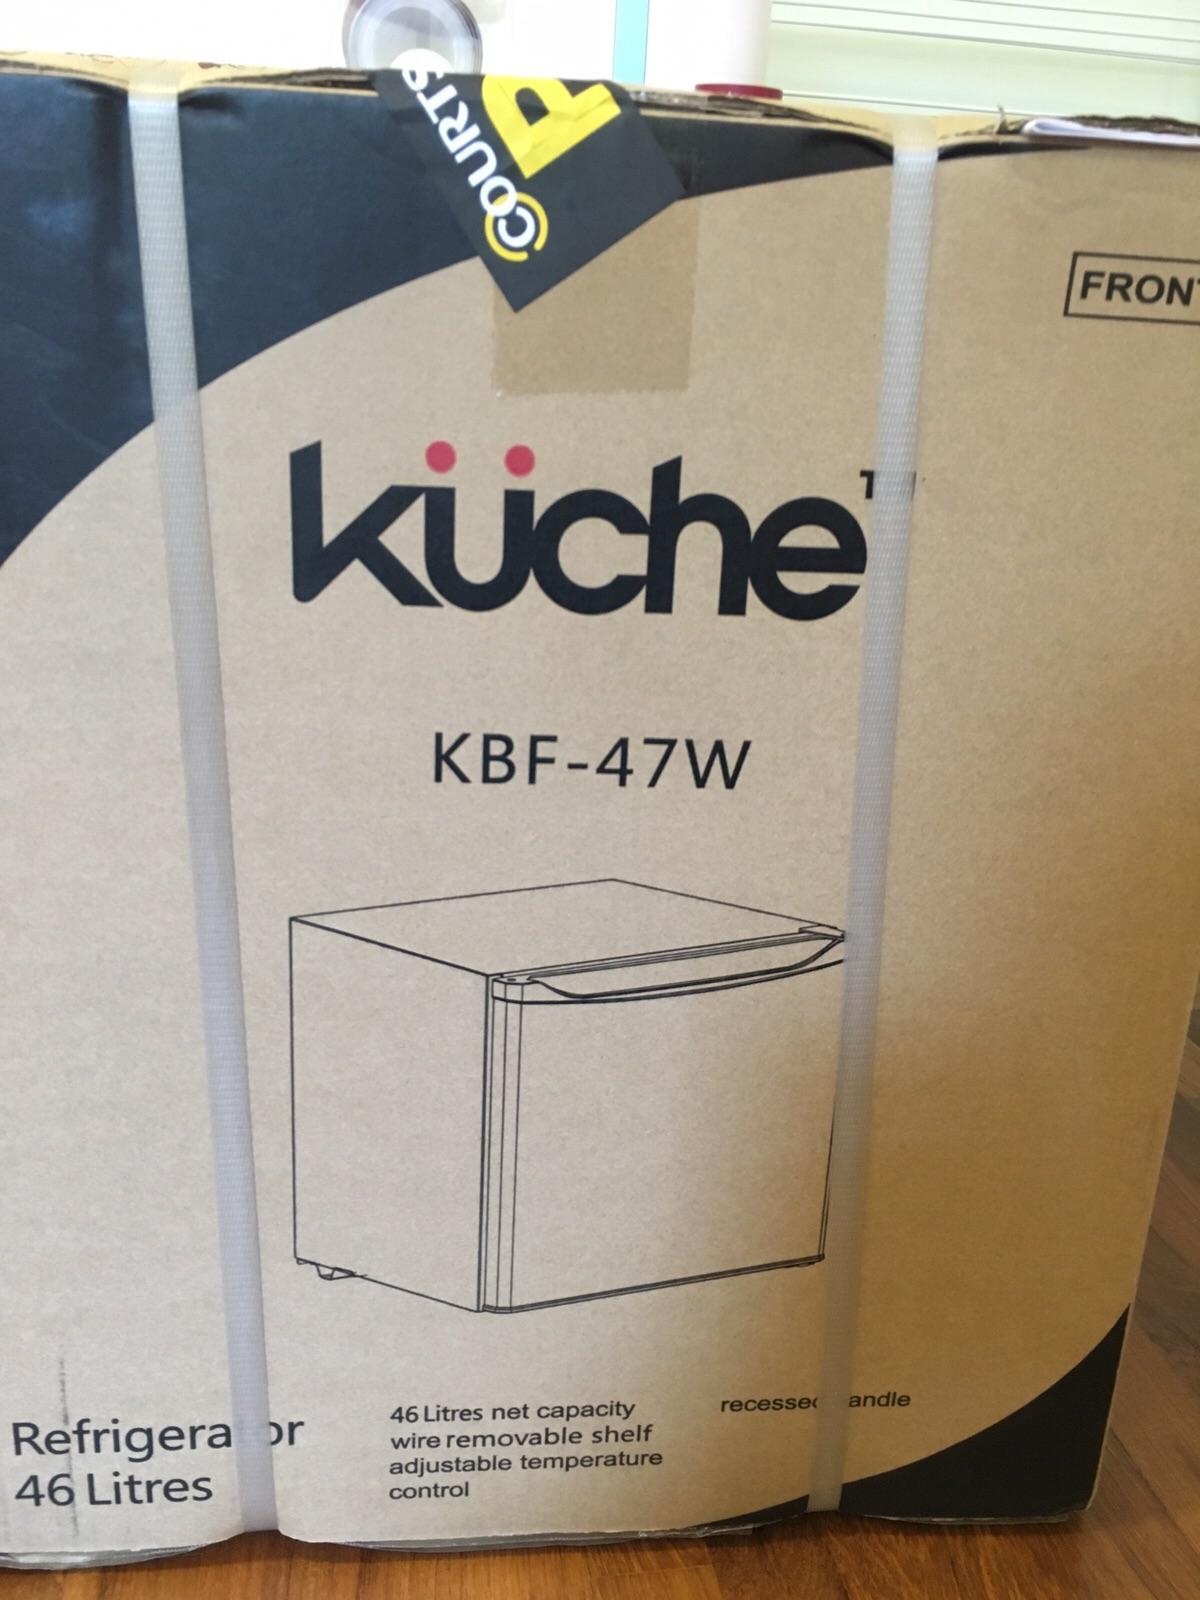 Kuche Bar Fridge 46 Litres - KBF-47W, Home Appliances on Carousell